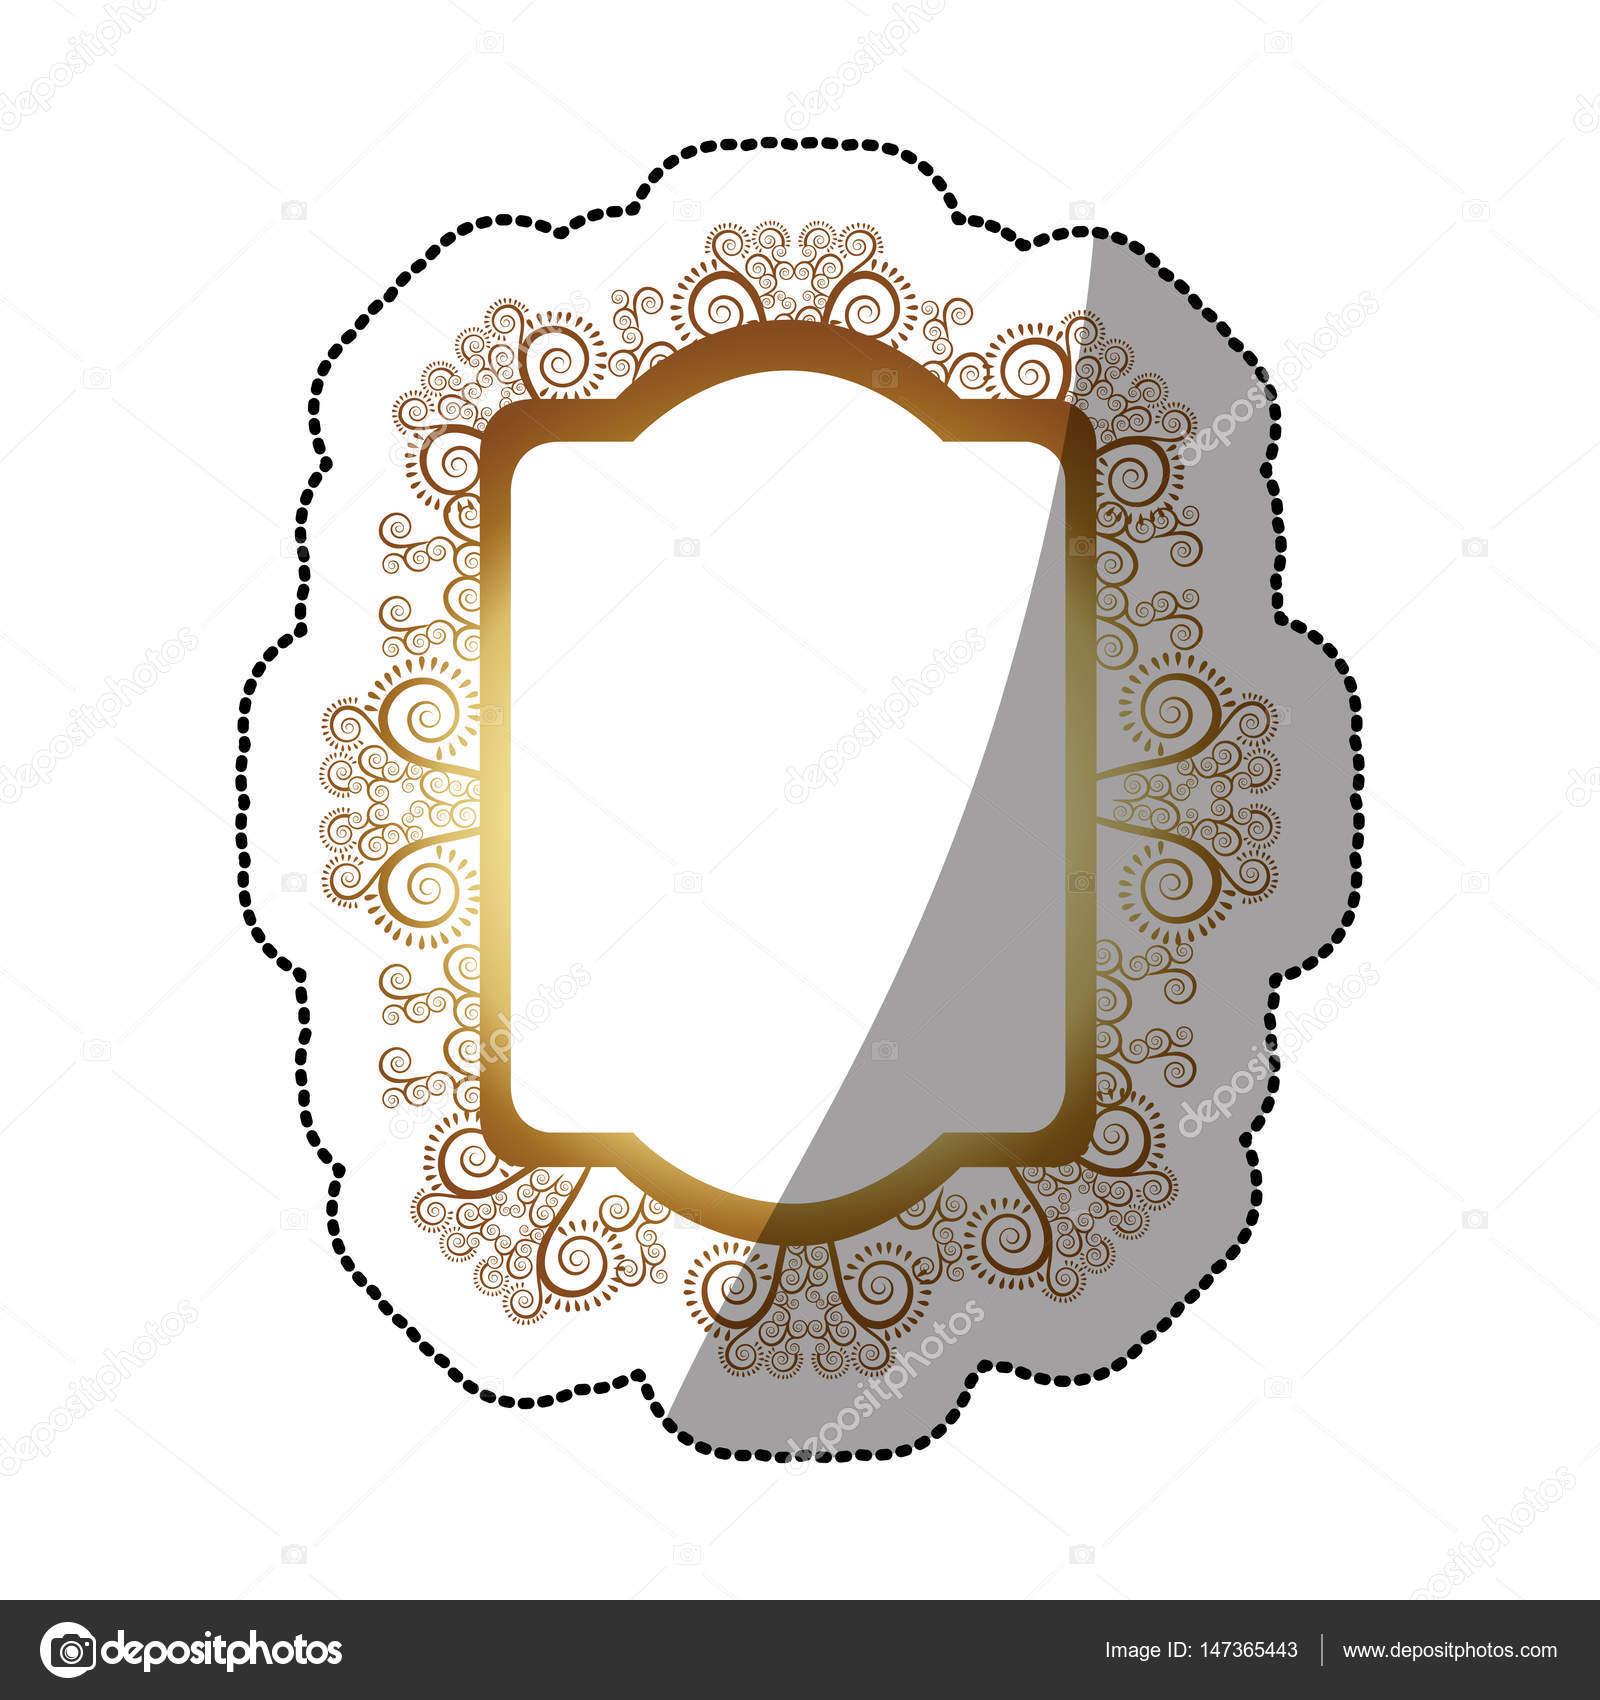 cadre baroque h raldique d autocollant dor rectangle ovale image vectorielle grgroupstock. Black Bedroom Furniture Sets. Home Design Ideas